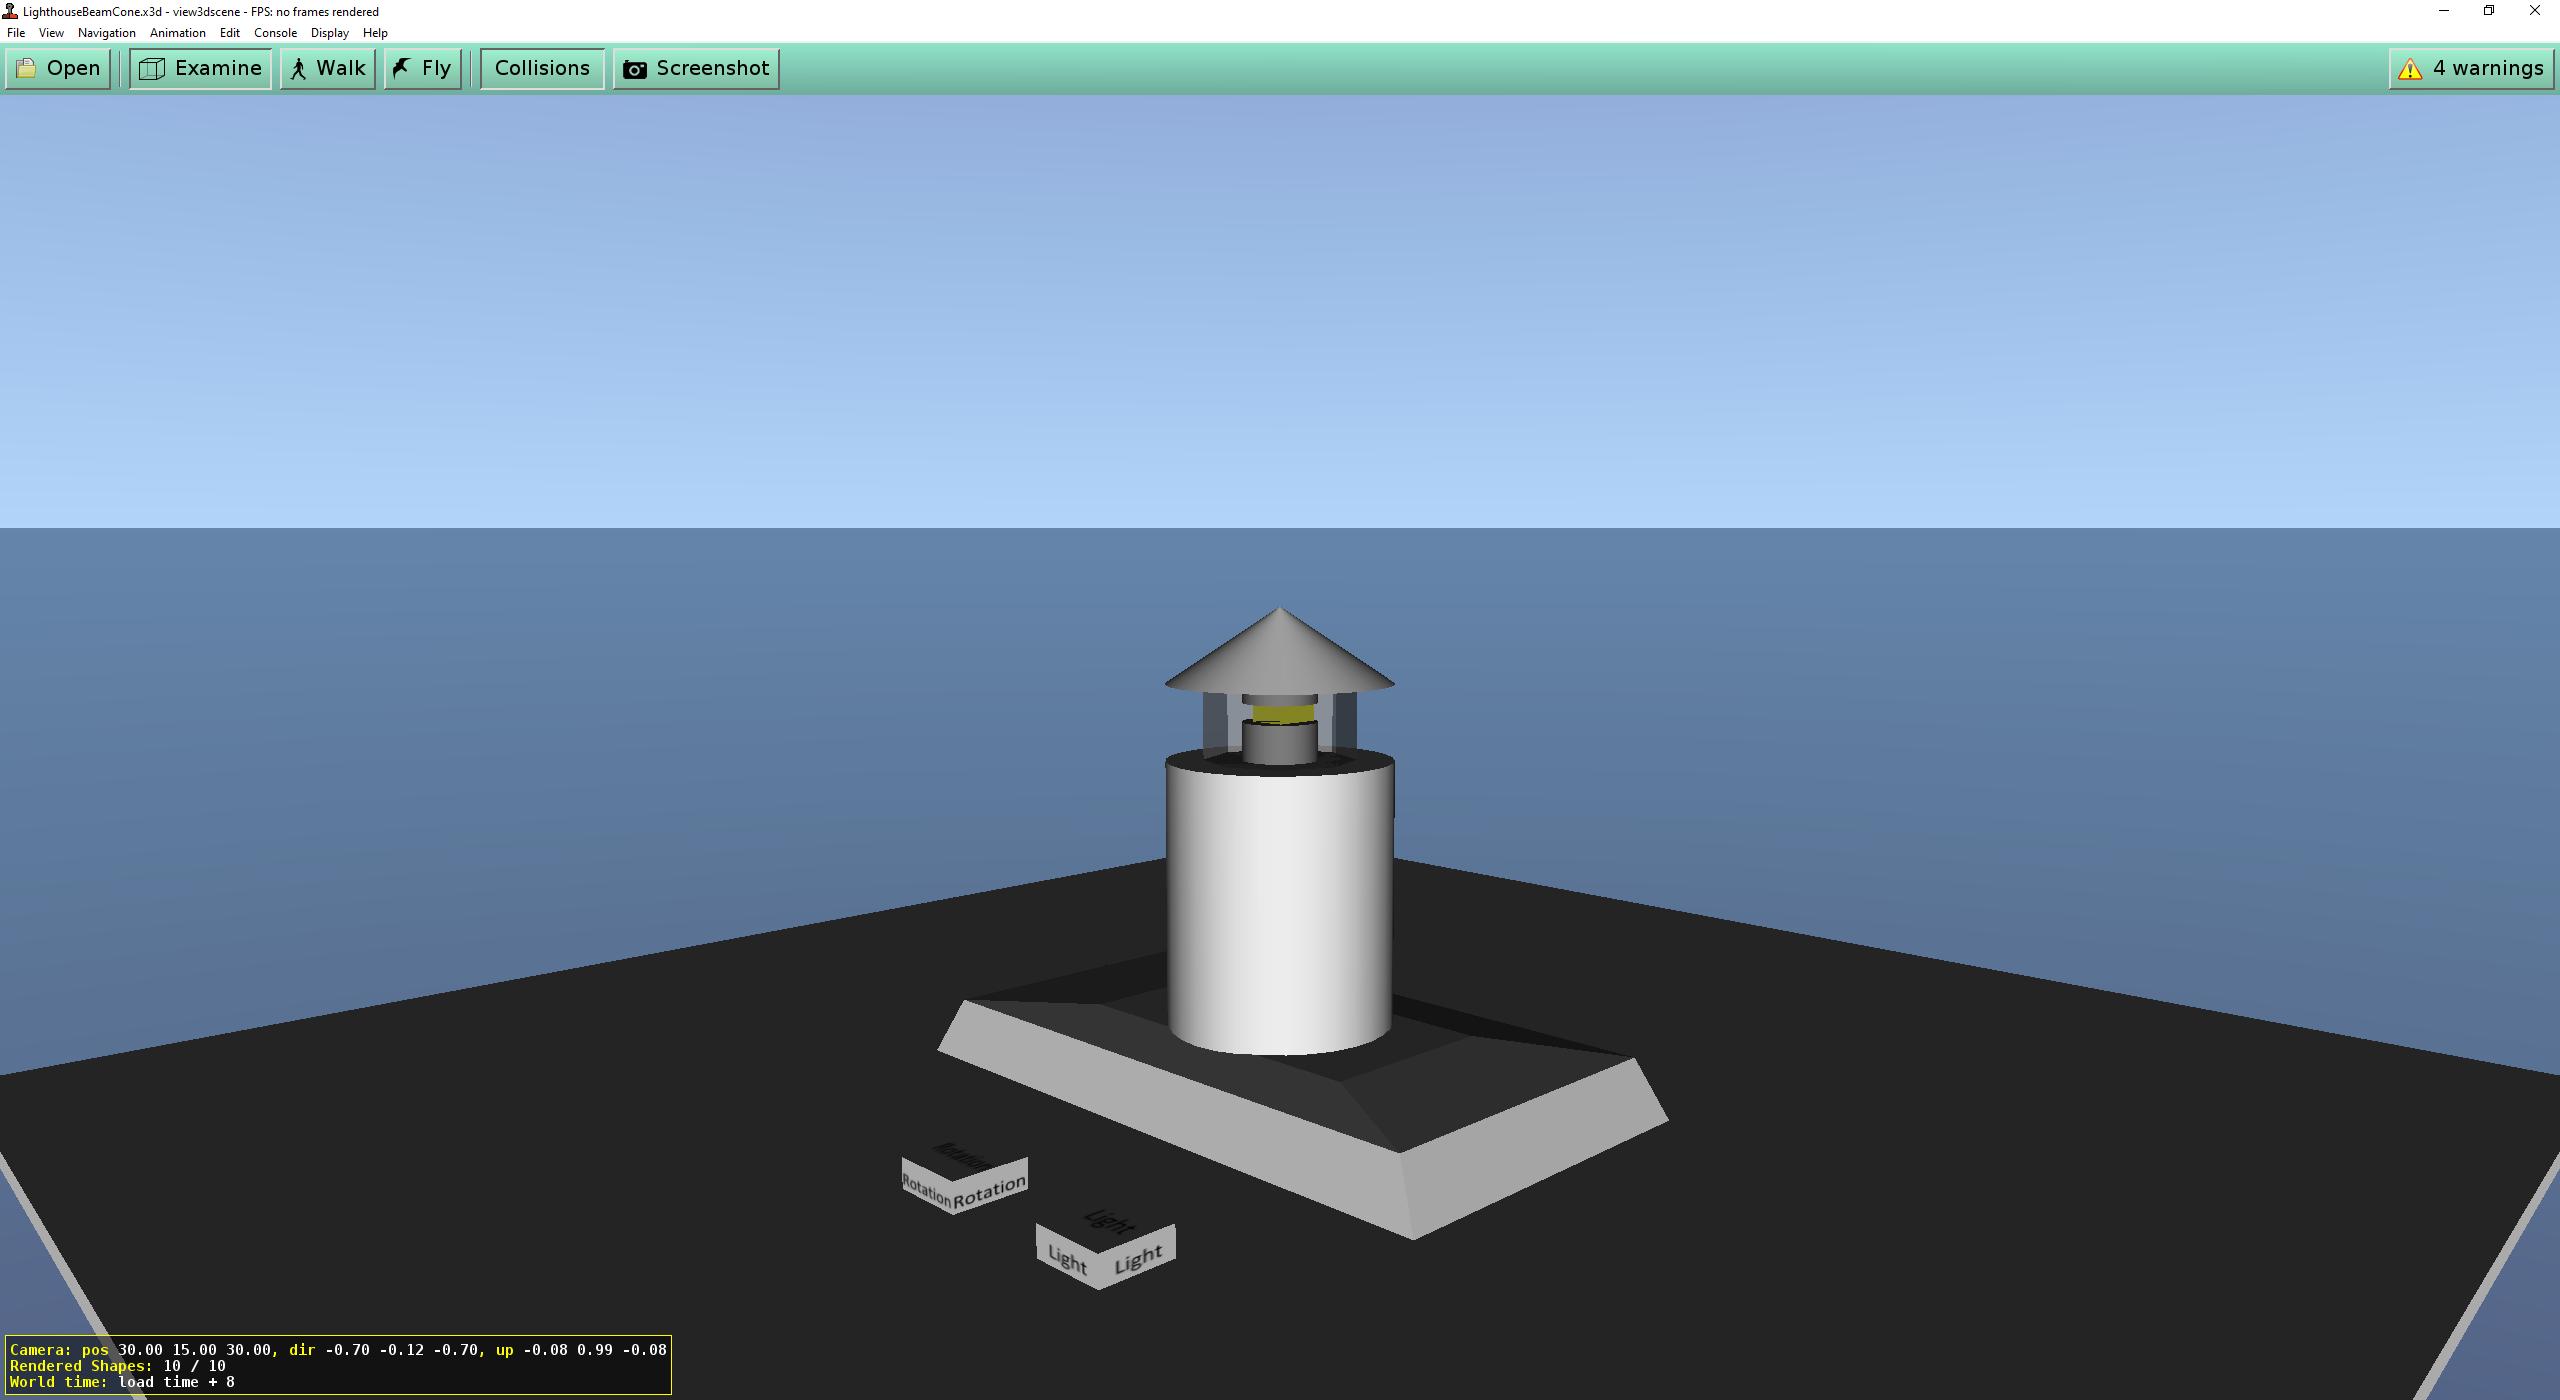 BrennenstuhlTobias/Screenshots/Player/Lighthouse/LightHouse.view3dscene.png